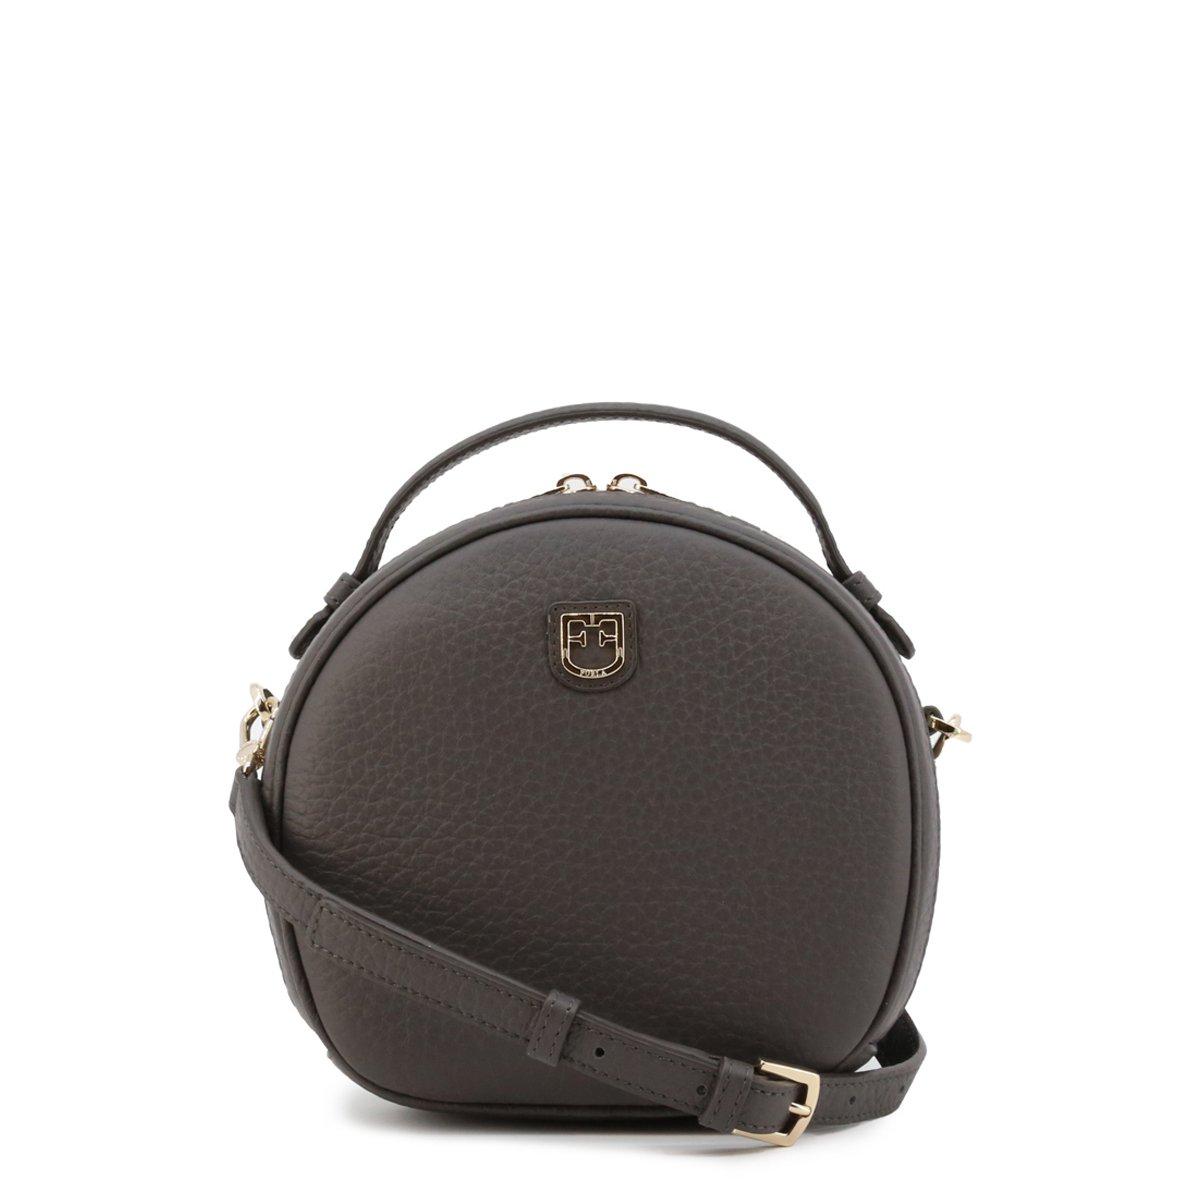 Furla Women's Handbag Various Colours DOTTY_WB00107 - grey NOSIZE